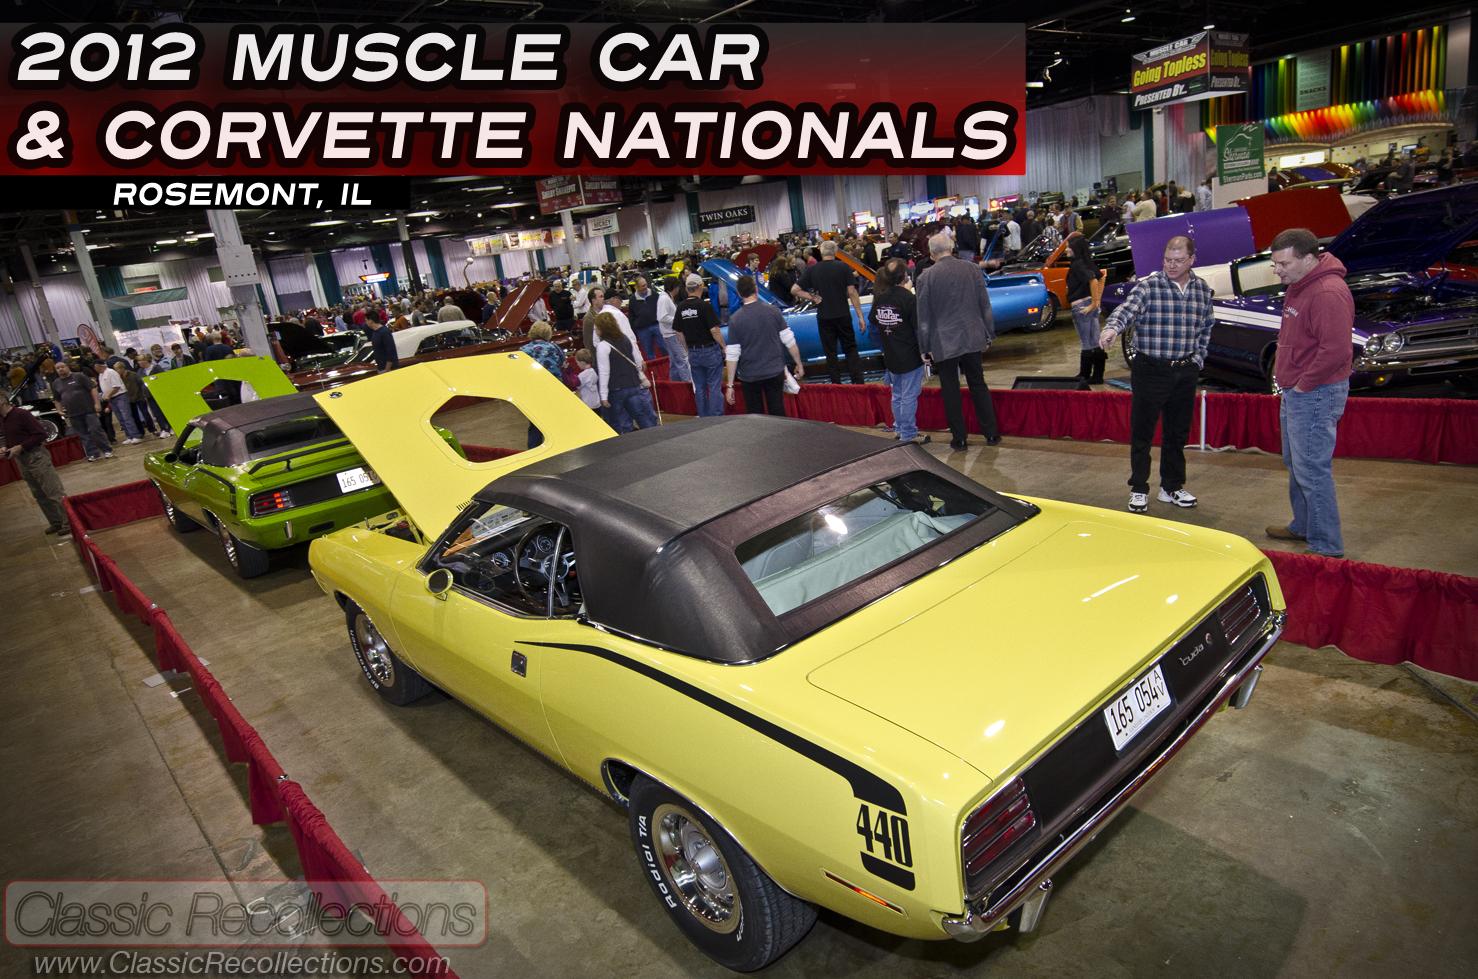 Mcacn 2012 Muscle Car Corvette National Rosemont Illinois